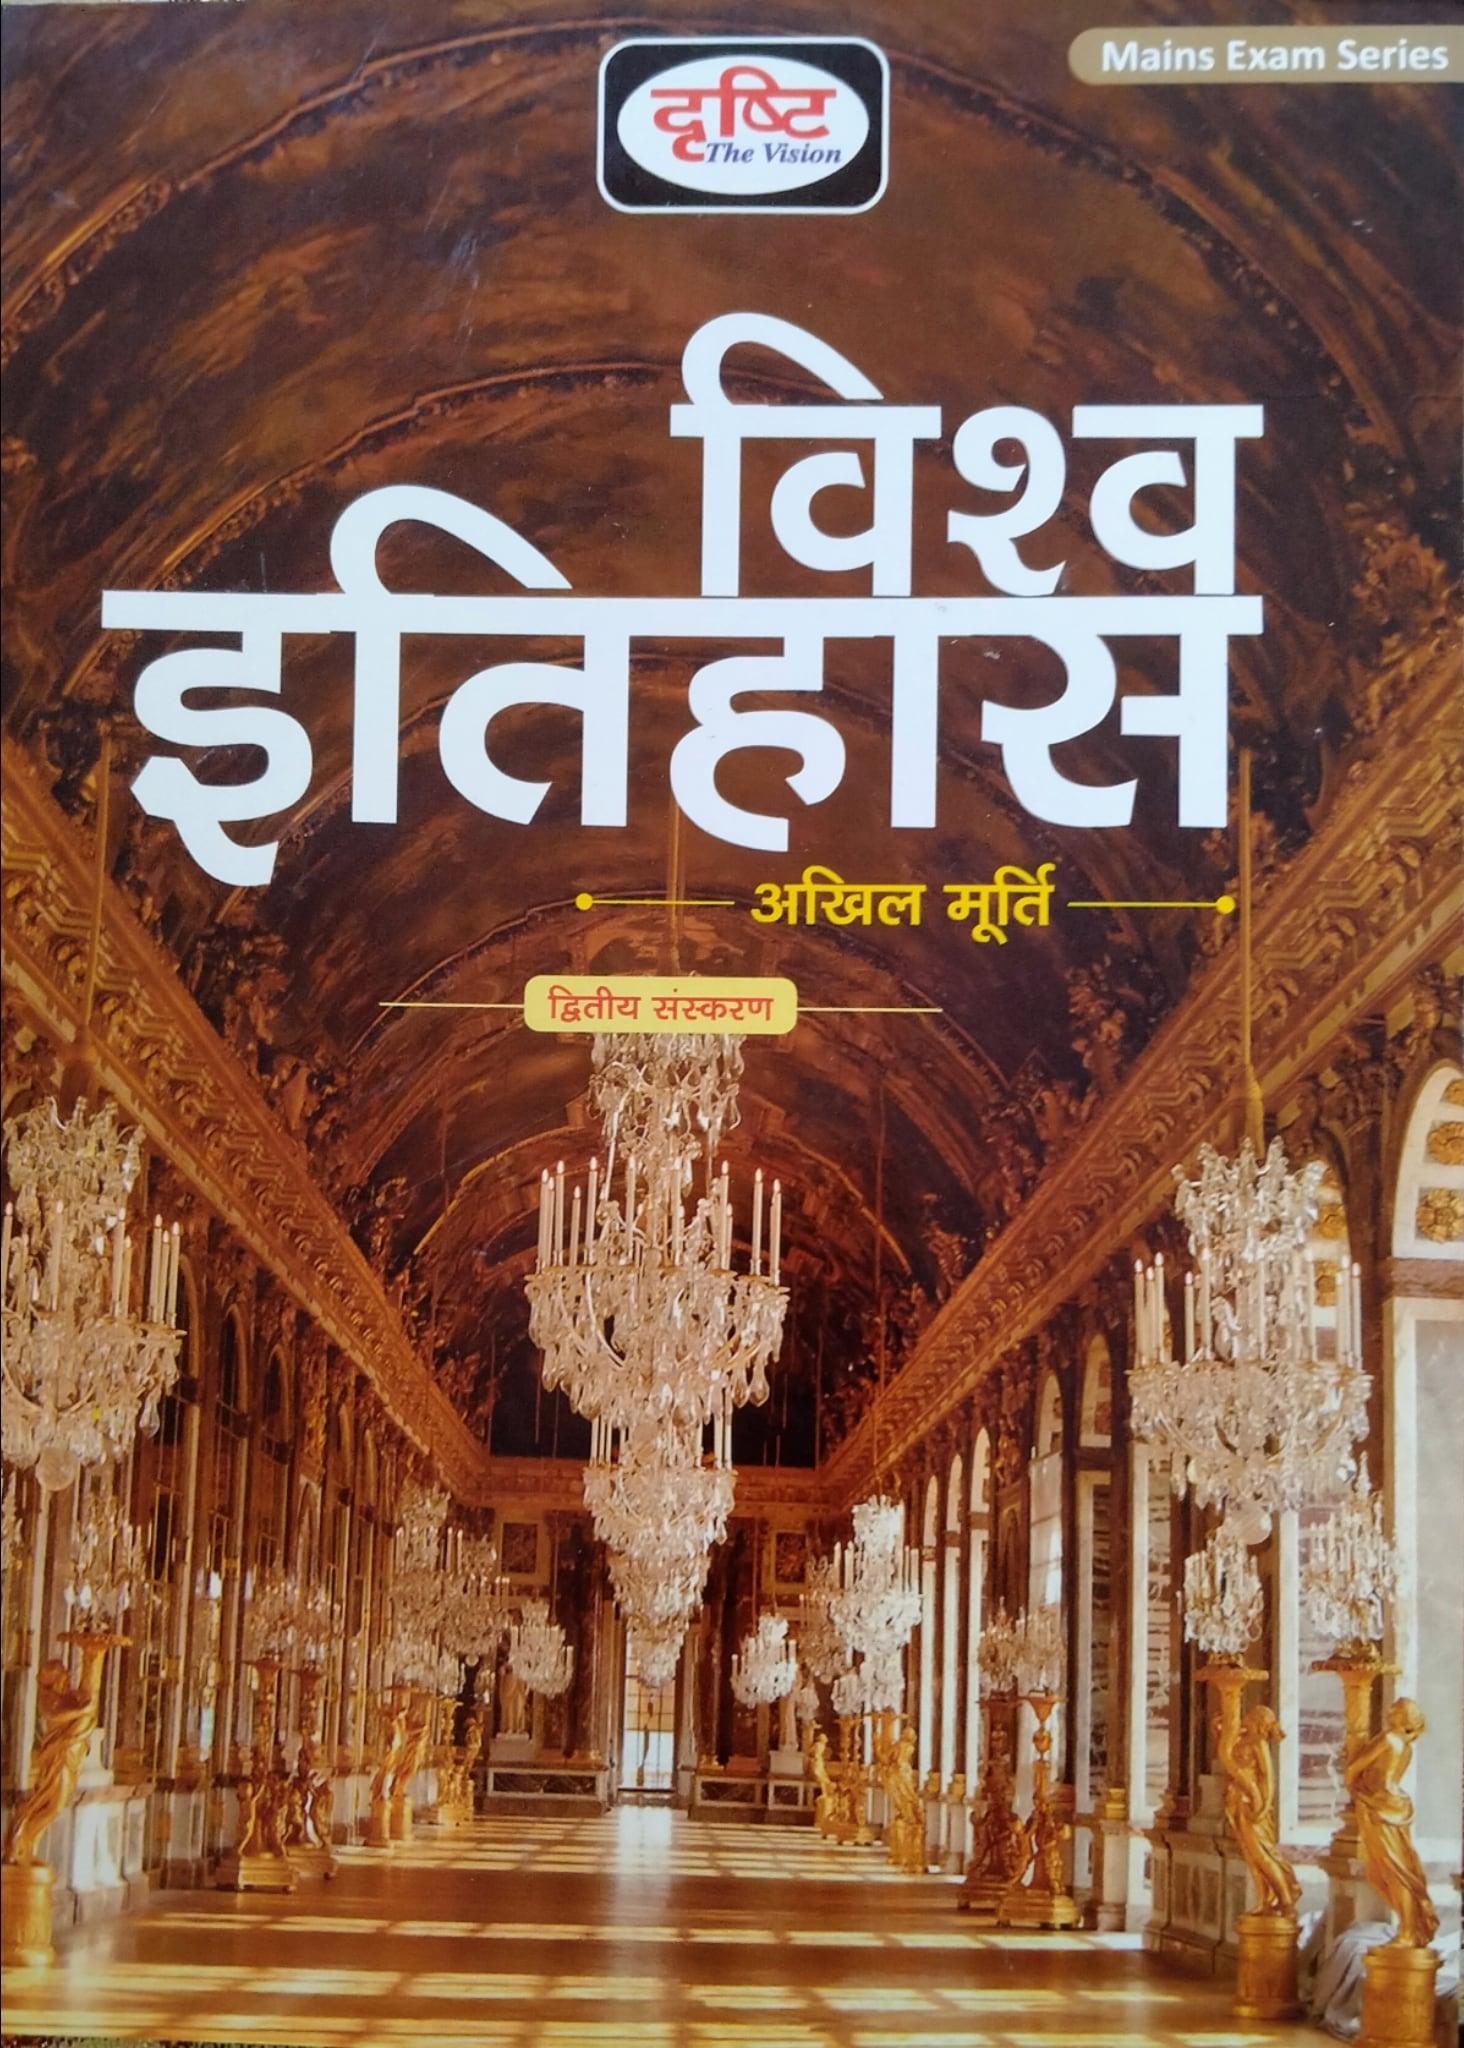 Dristhi Vishva Itihas 2nd Edition Mains Exam Series